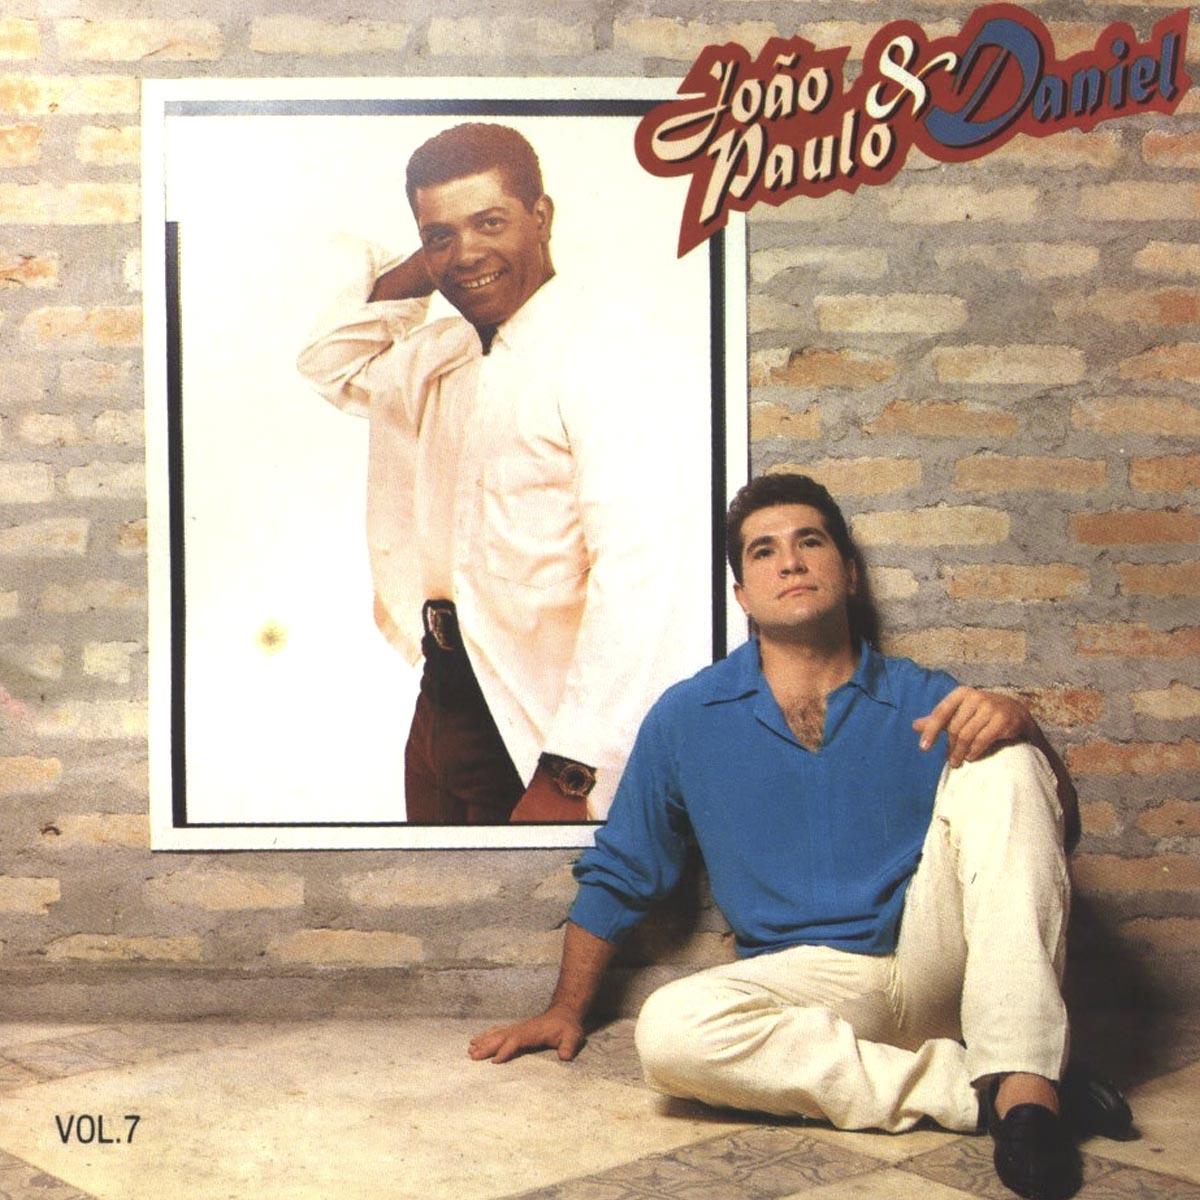 CD João Paulo & Daniel Volume 7